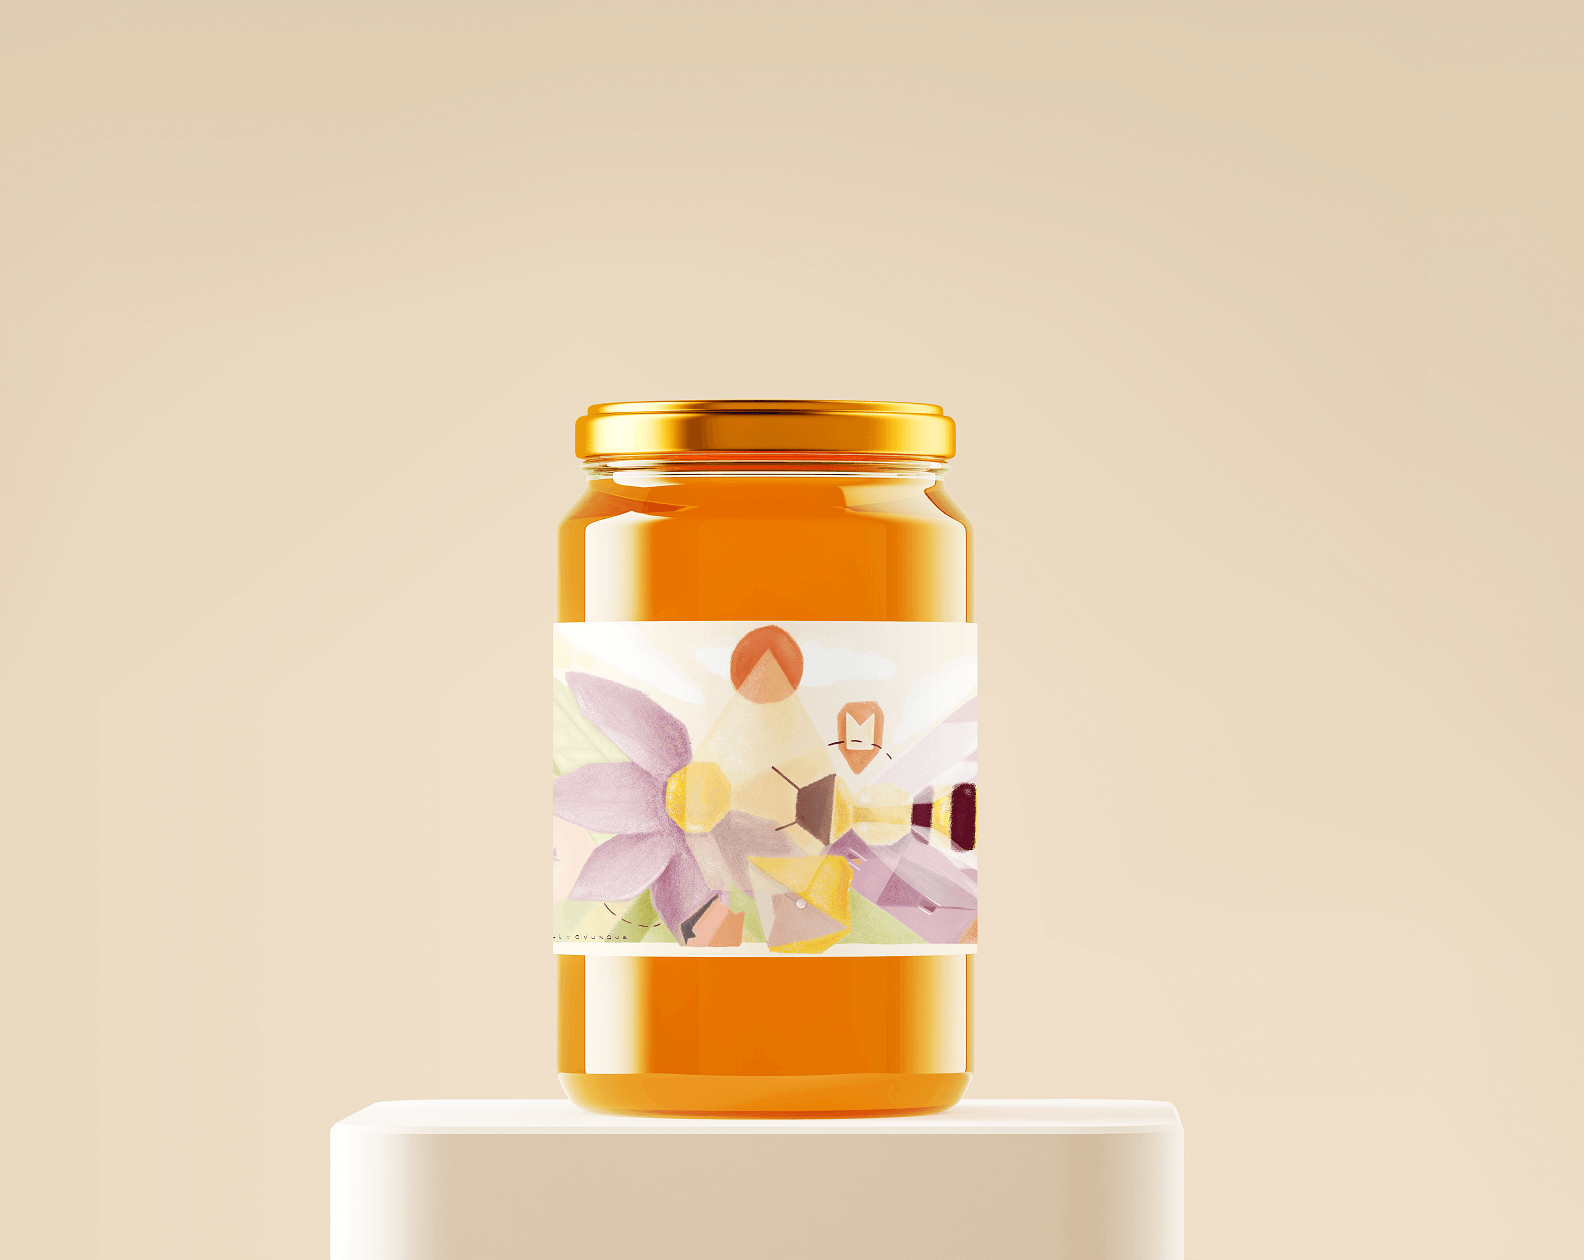 etichette miele gocce apiario d'autore